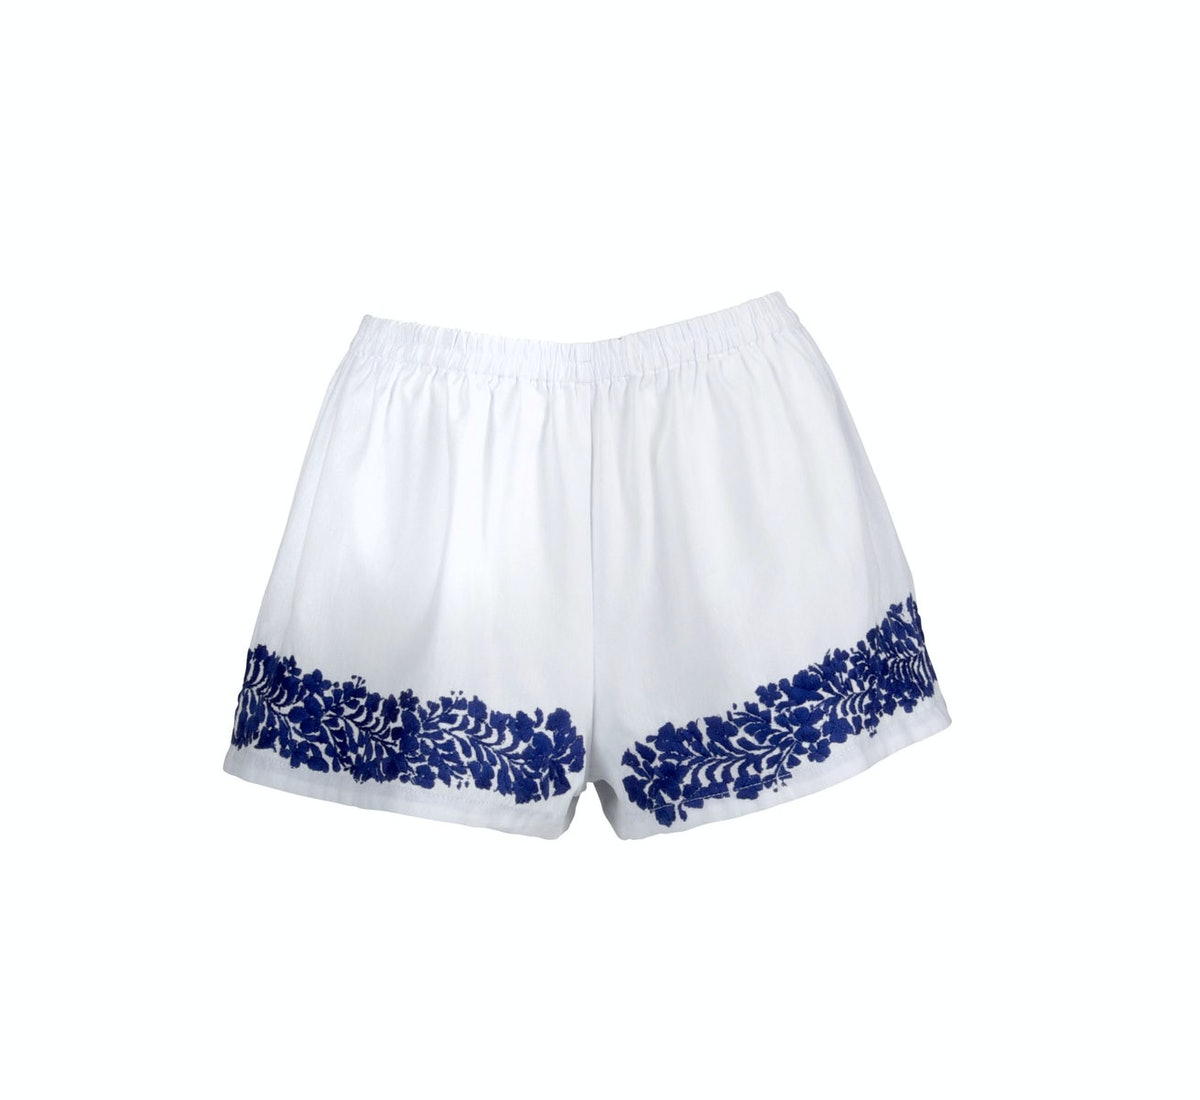 Mi Golondrina shorts